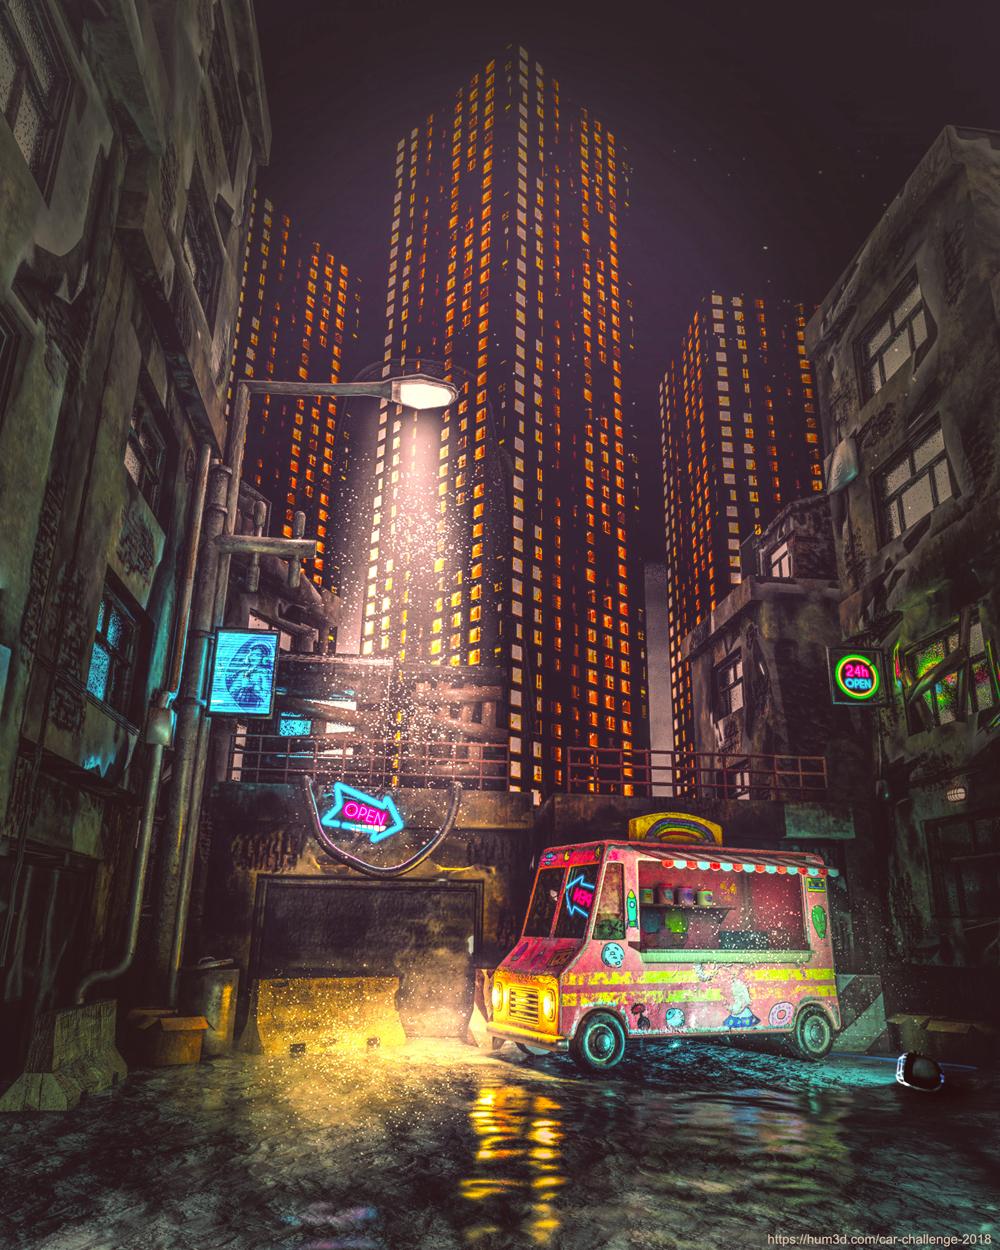 Back of the City by Ahmet Salih